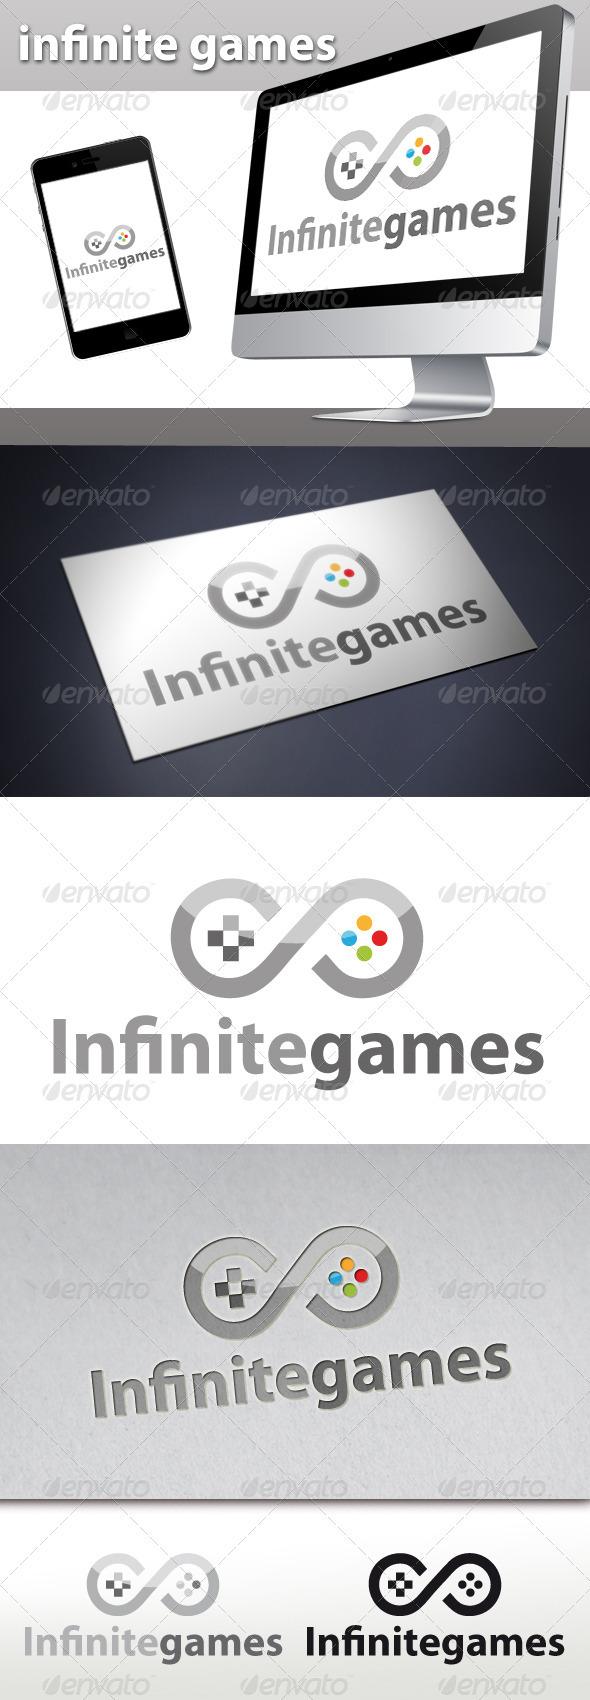 Infinite Games Logo